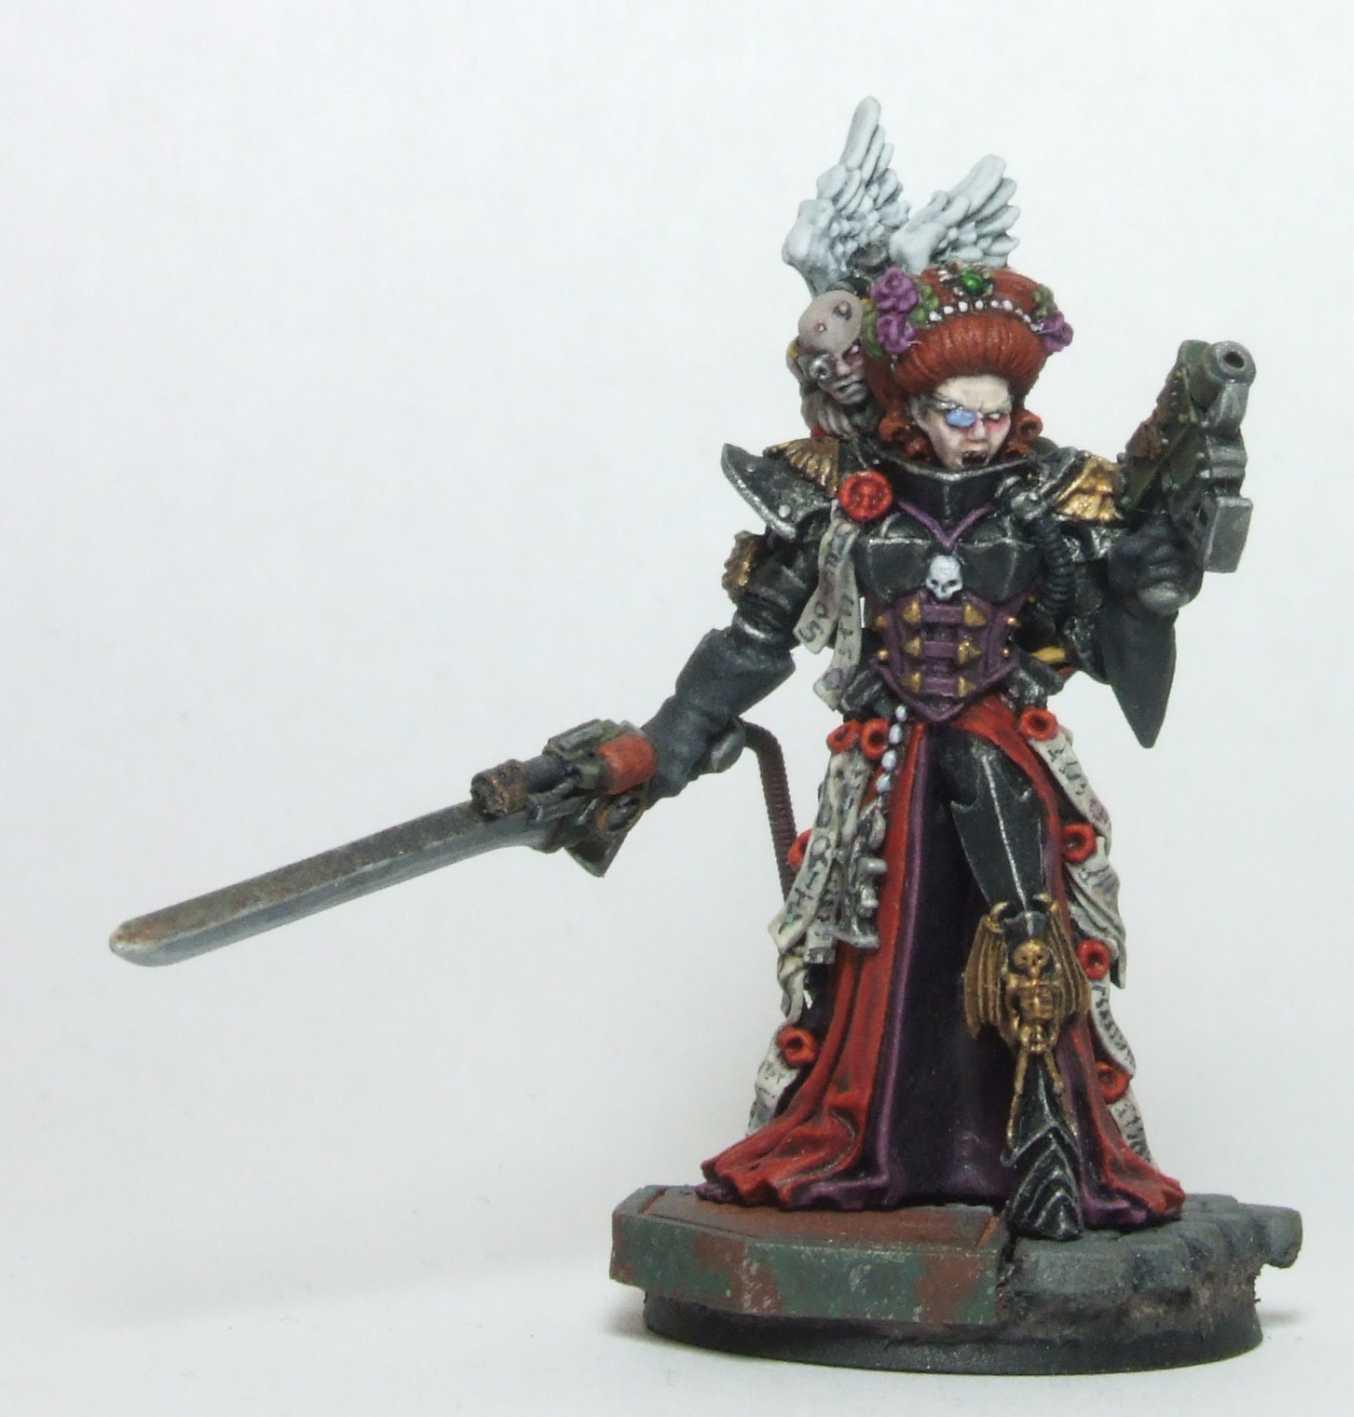 Cherub, Female, Inq28, Inquisitor, Ordo Hereticus, Warhammer 40,000